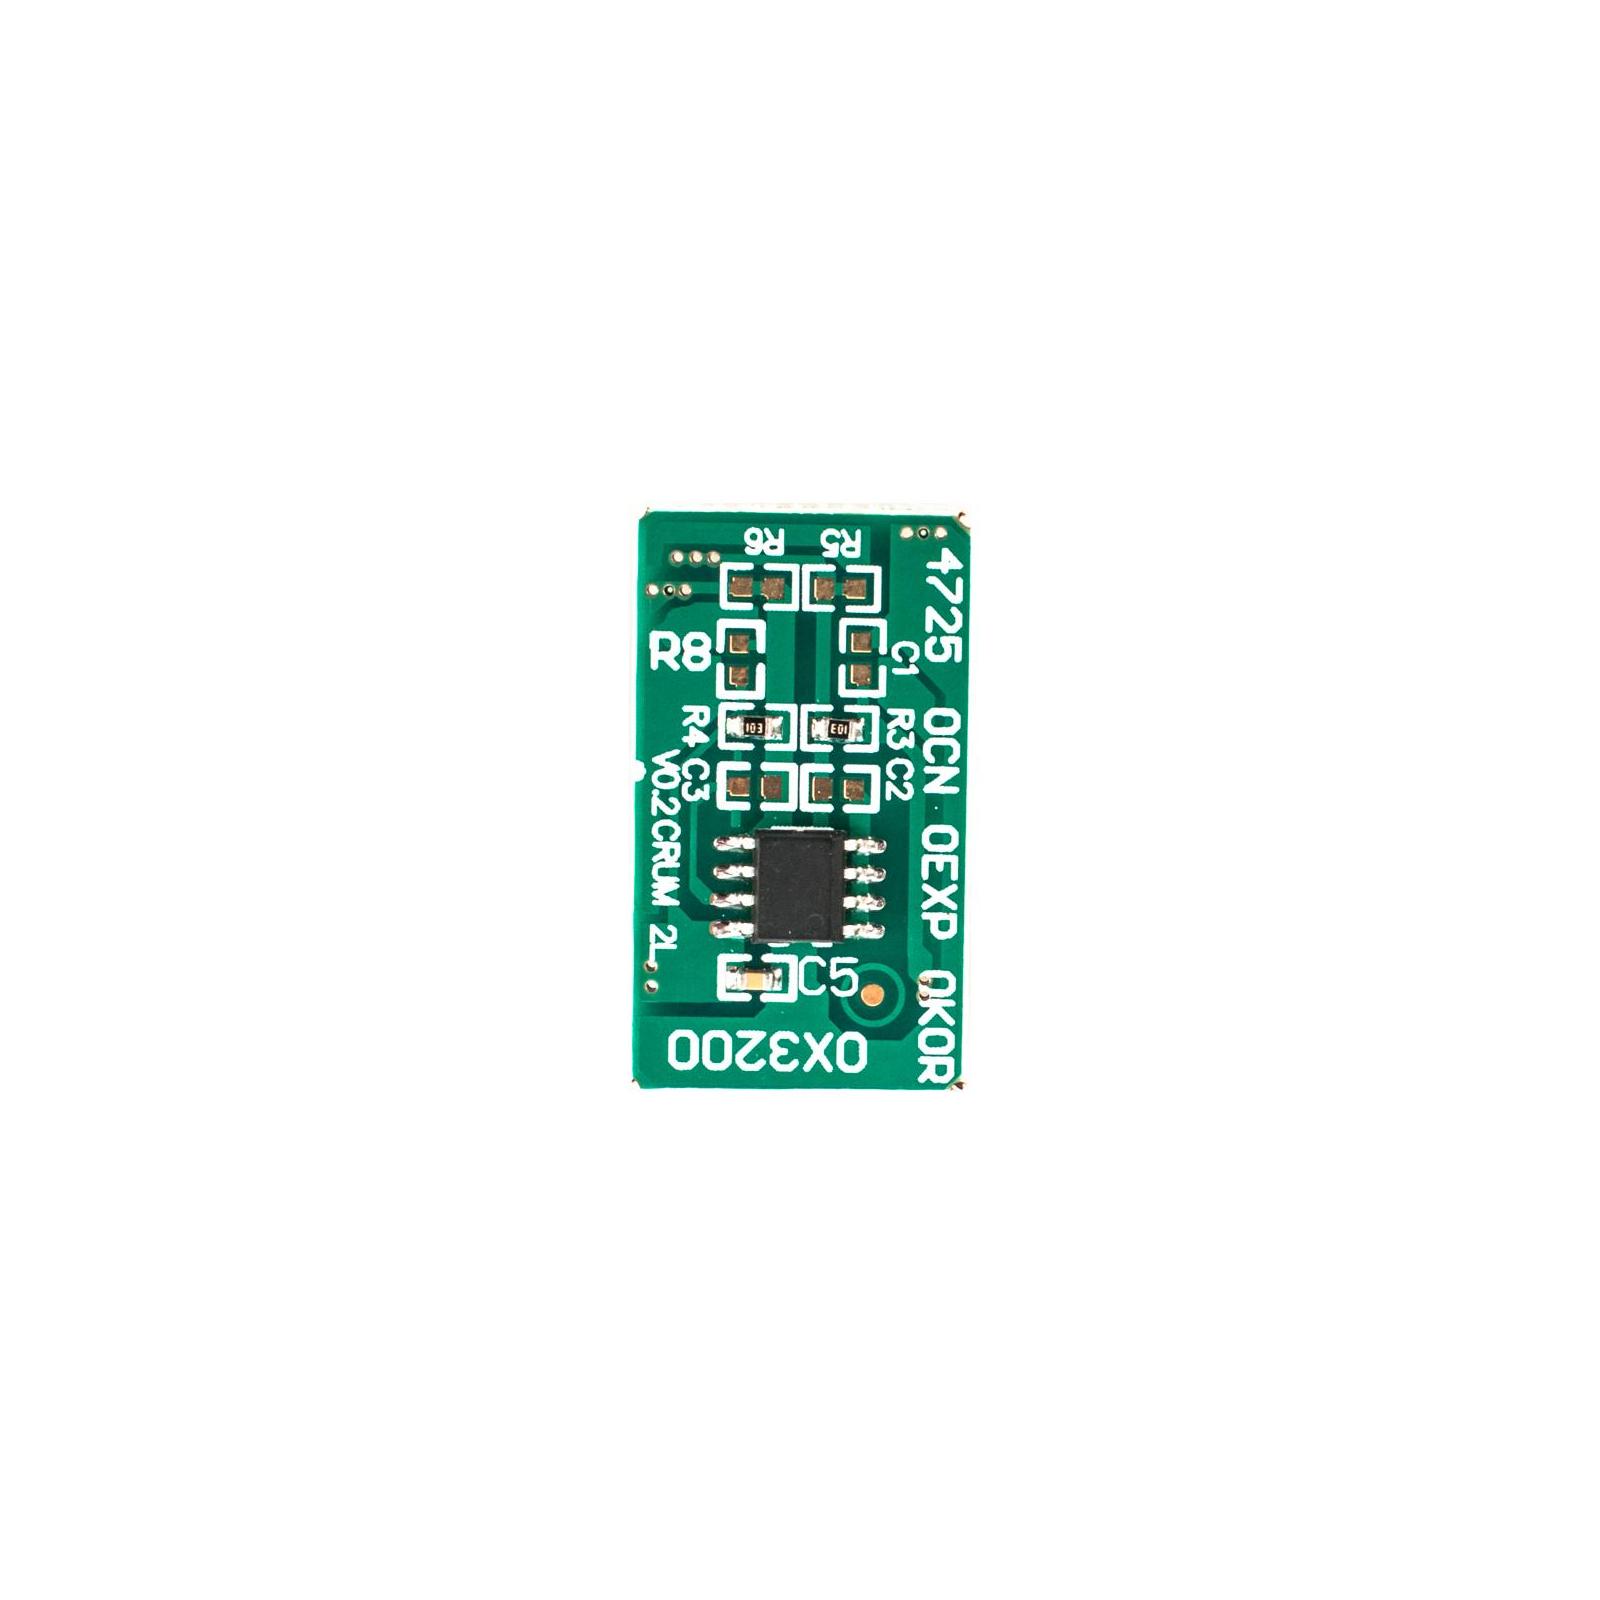 Чип для картриджа XEROX PE-220 (3K) 013R00621 Everprint (CHIP-XER-PE-220) изображение 2